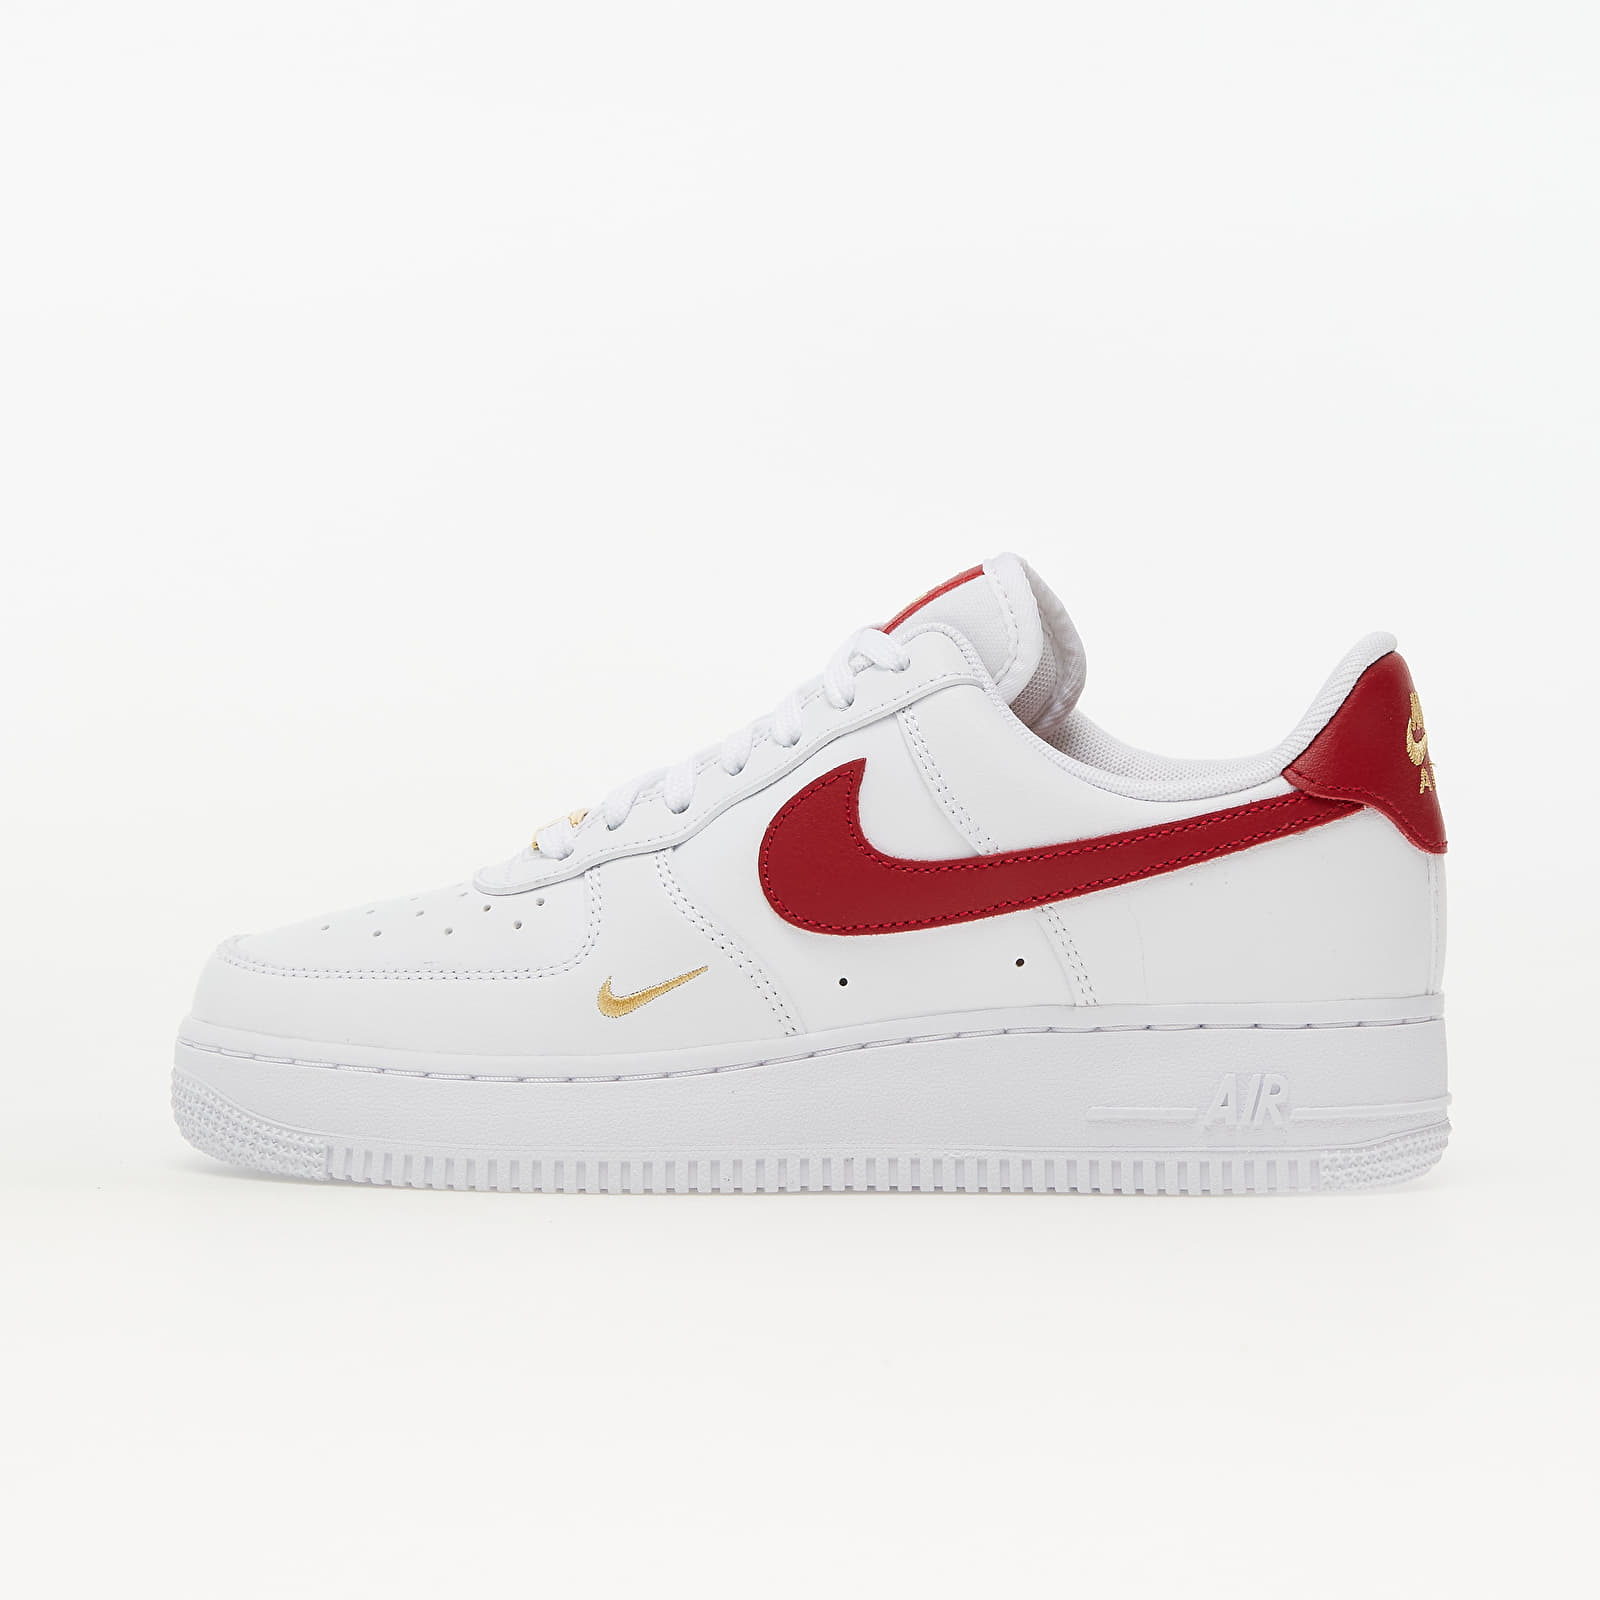 Nike W Air Force 1 '07 Essential White/ Gym Red-Gym Red-White EUR 42